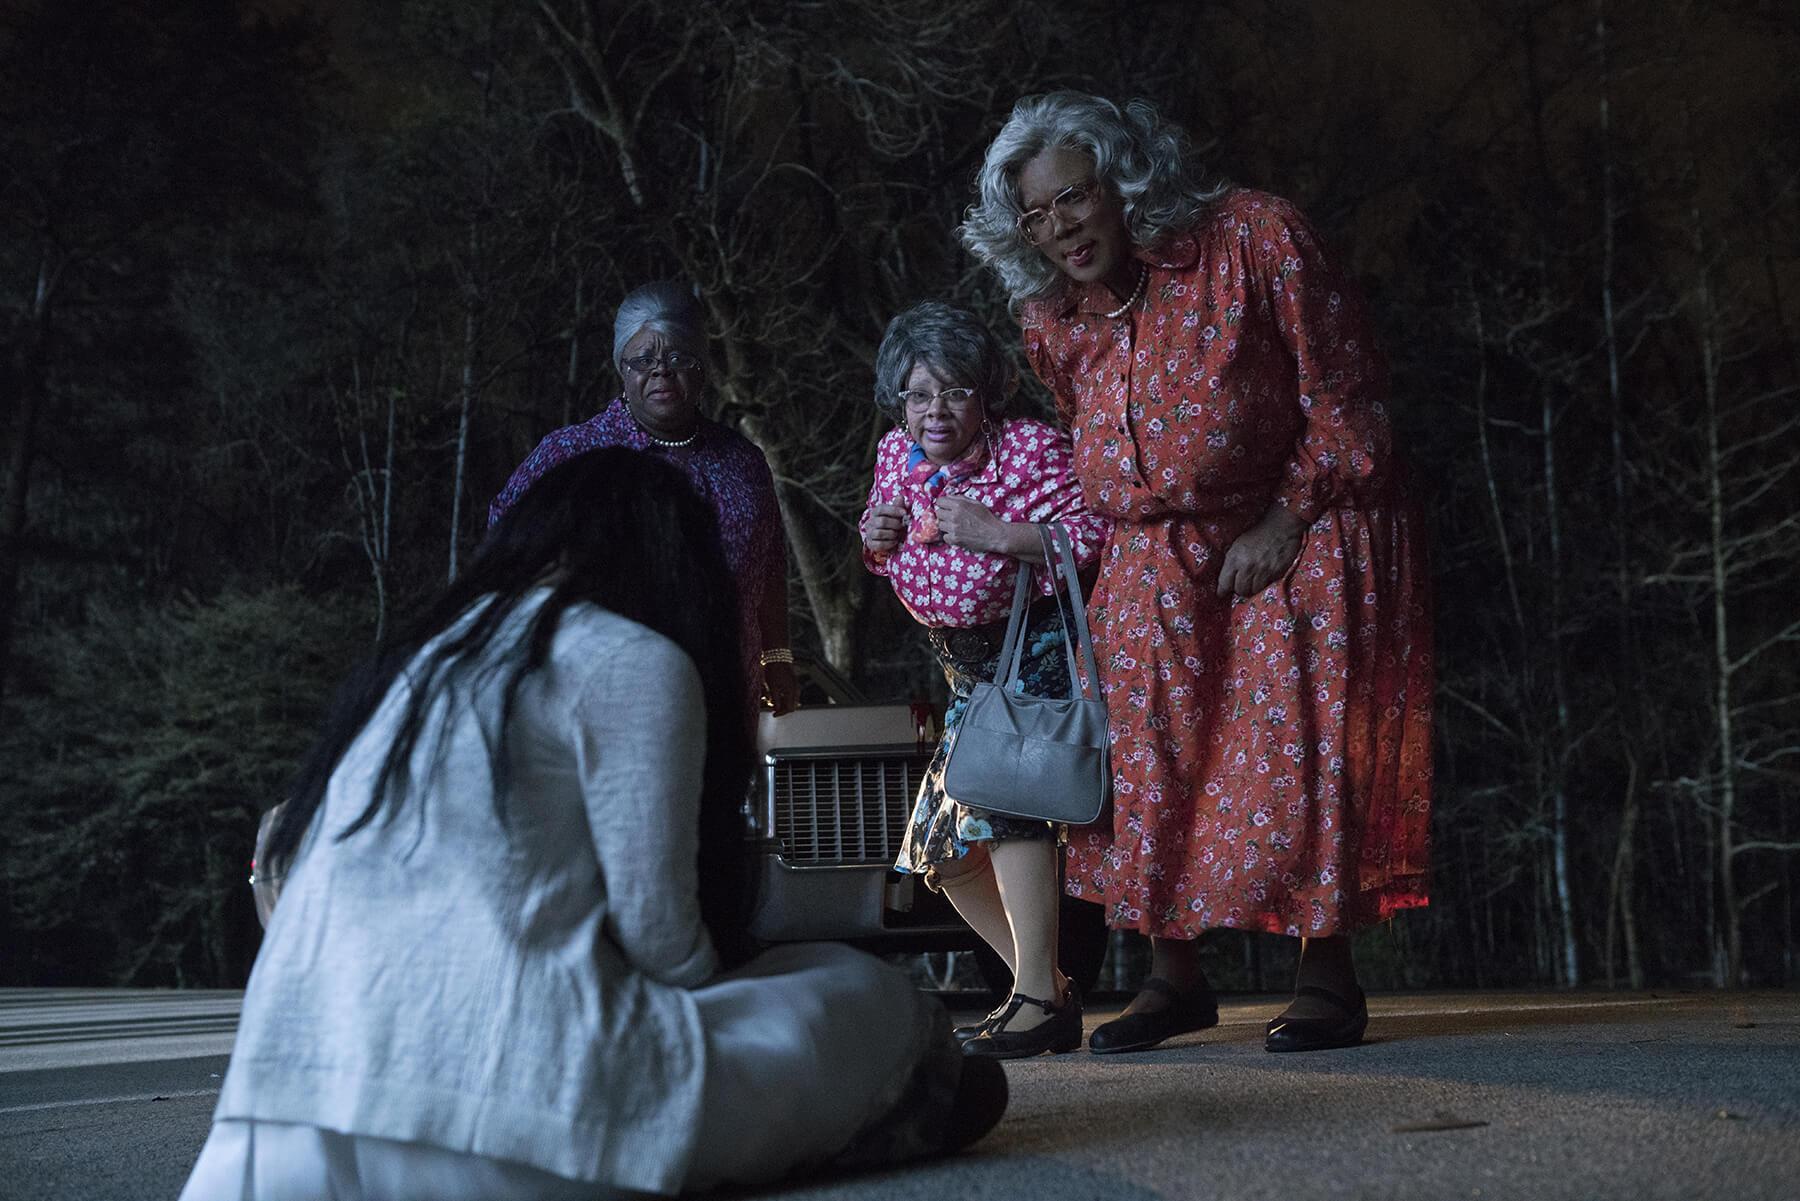 Tyler Perry's Boo 2! A Madea Halloween (2017) - Financial Information